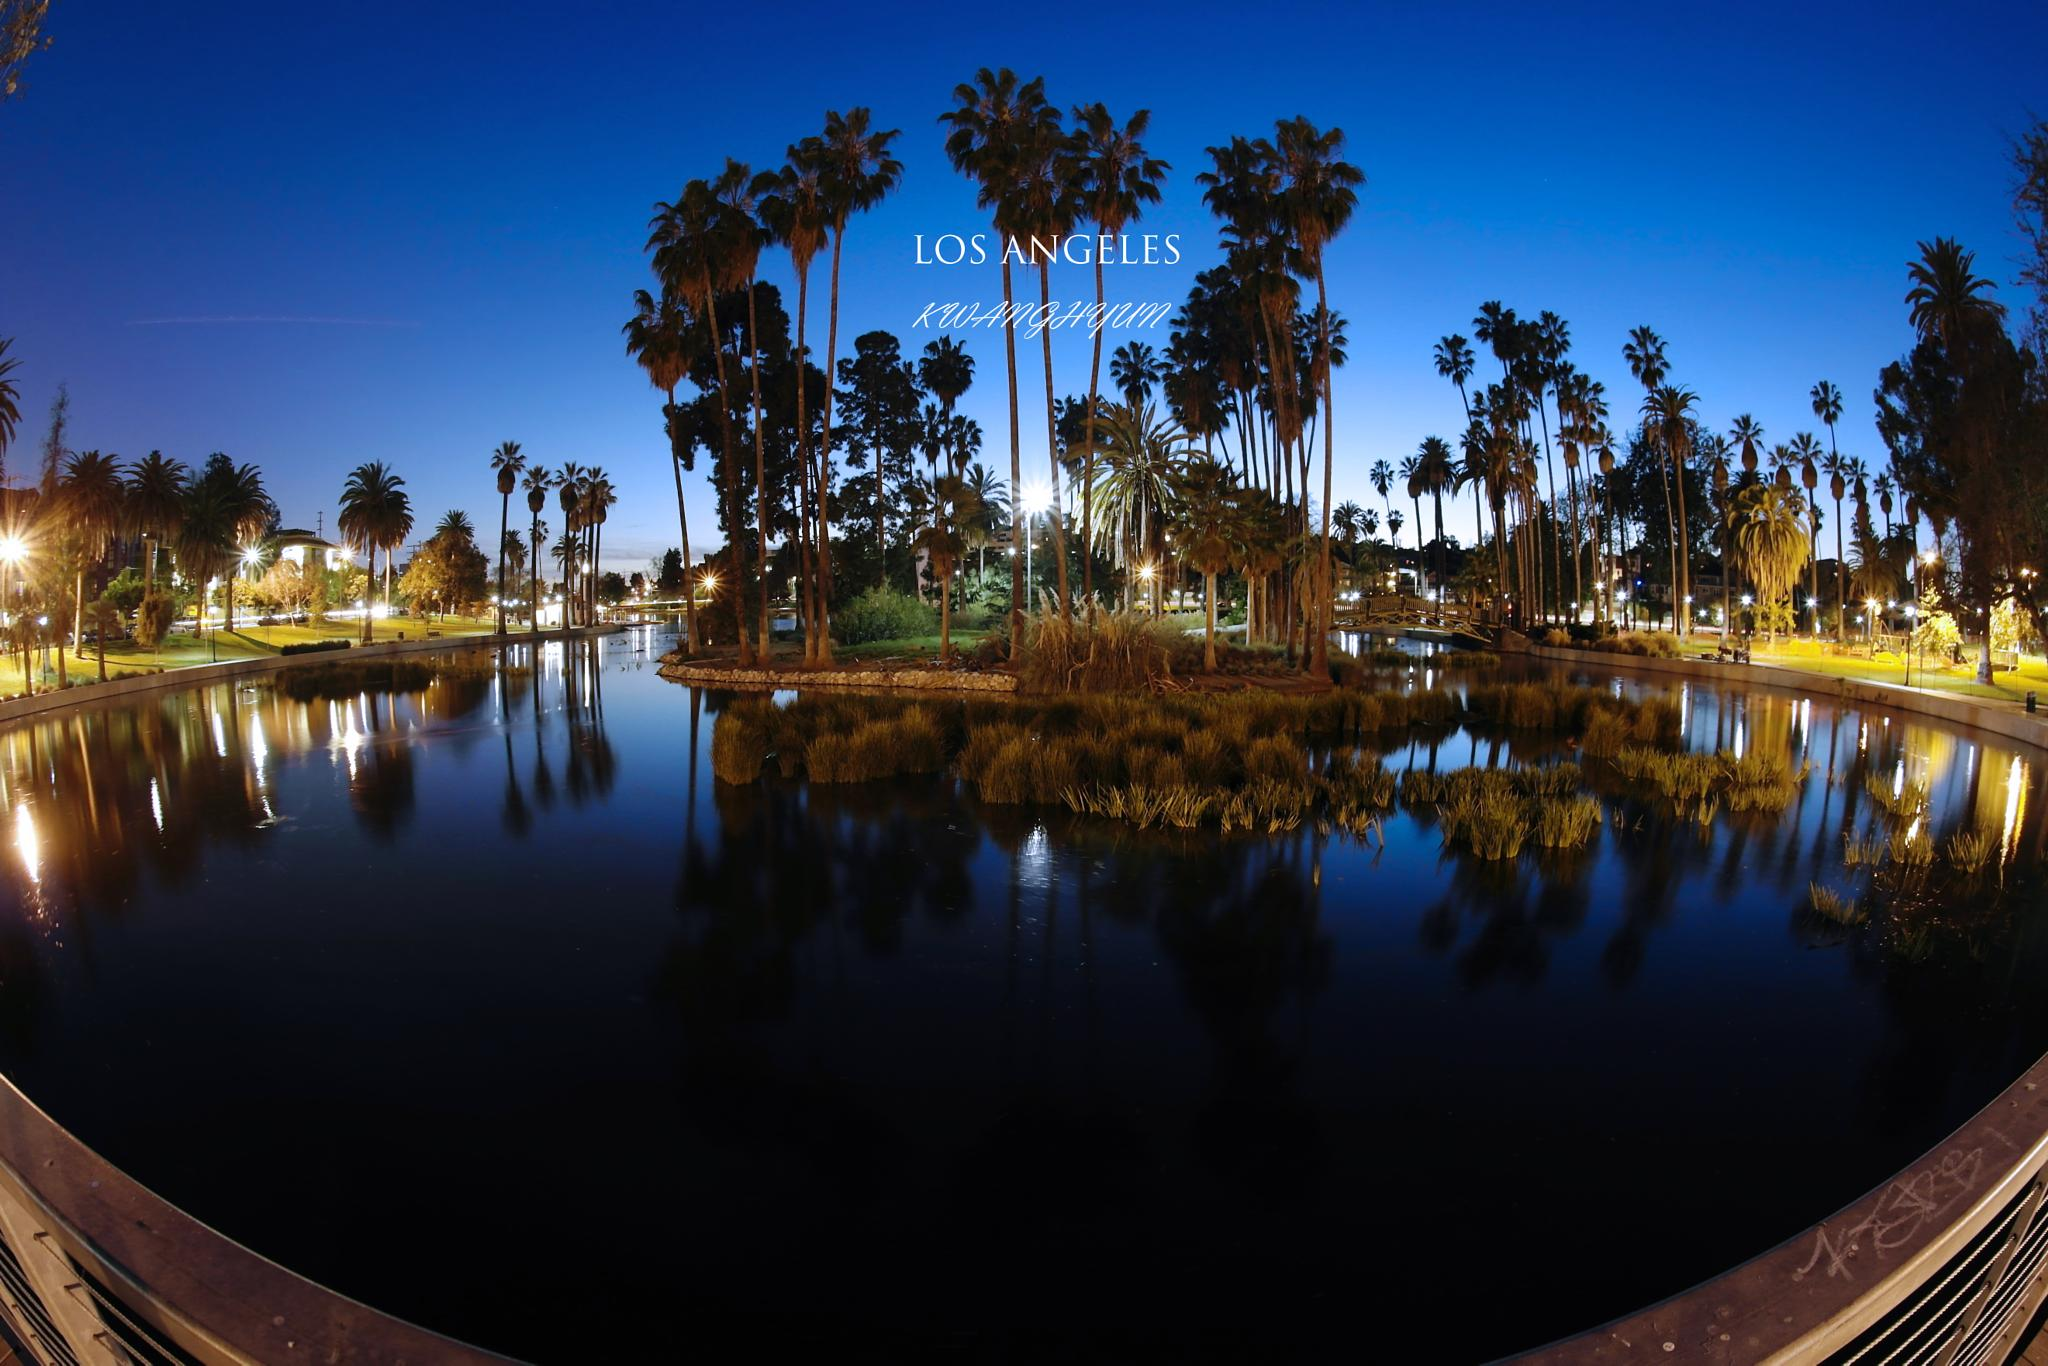 Echo Park At Night by visbimmer79